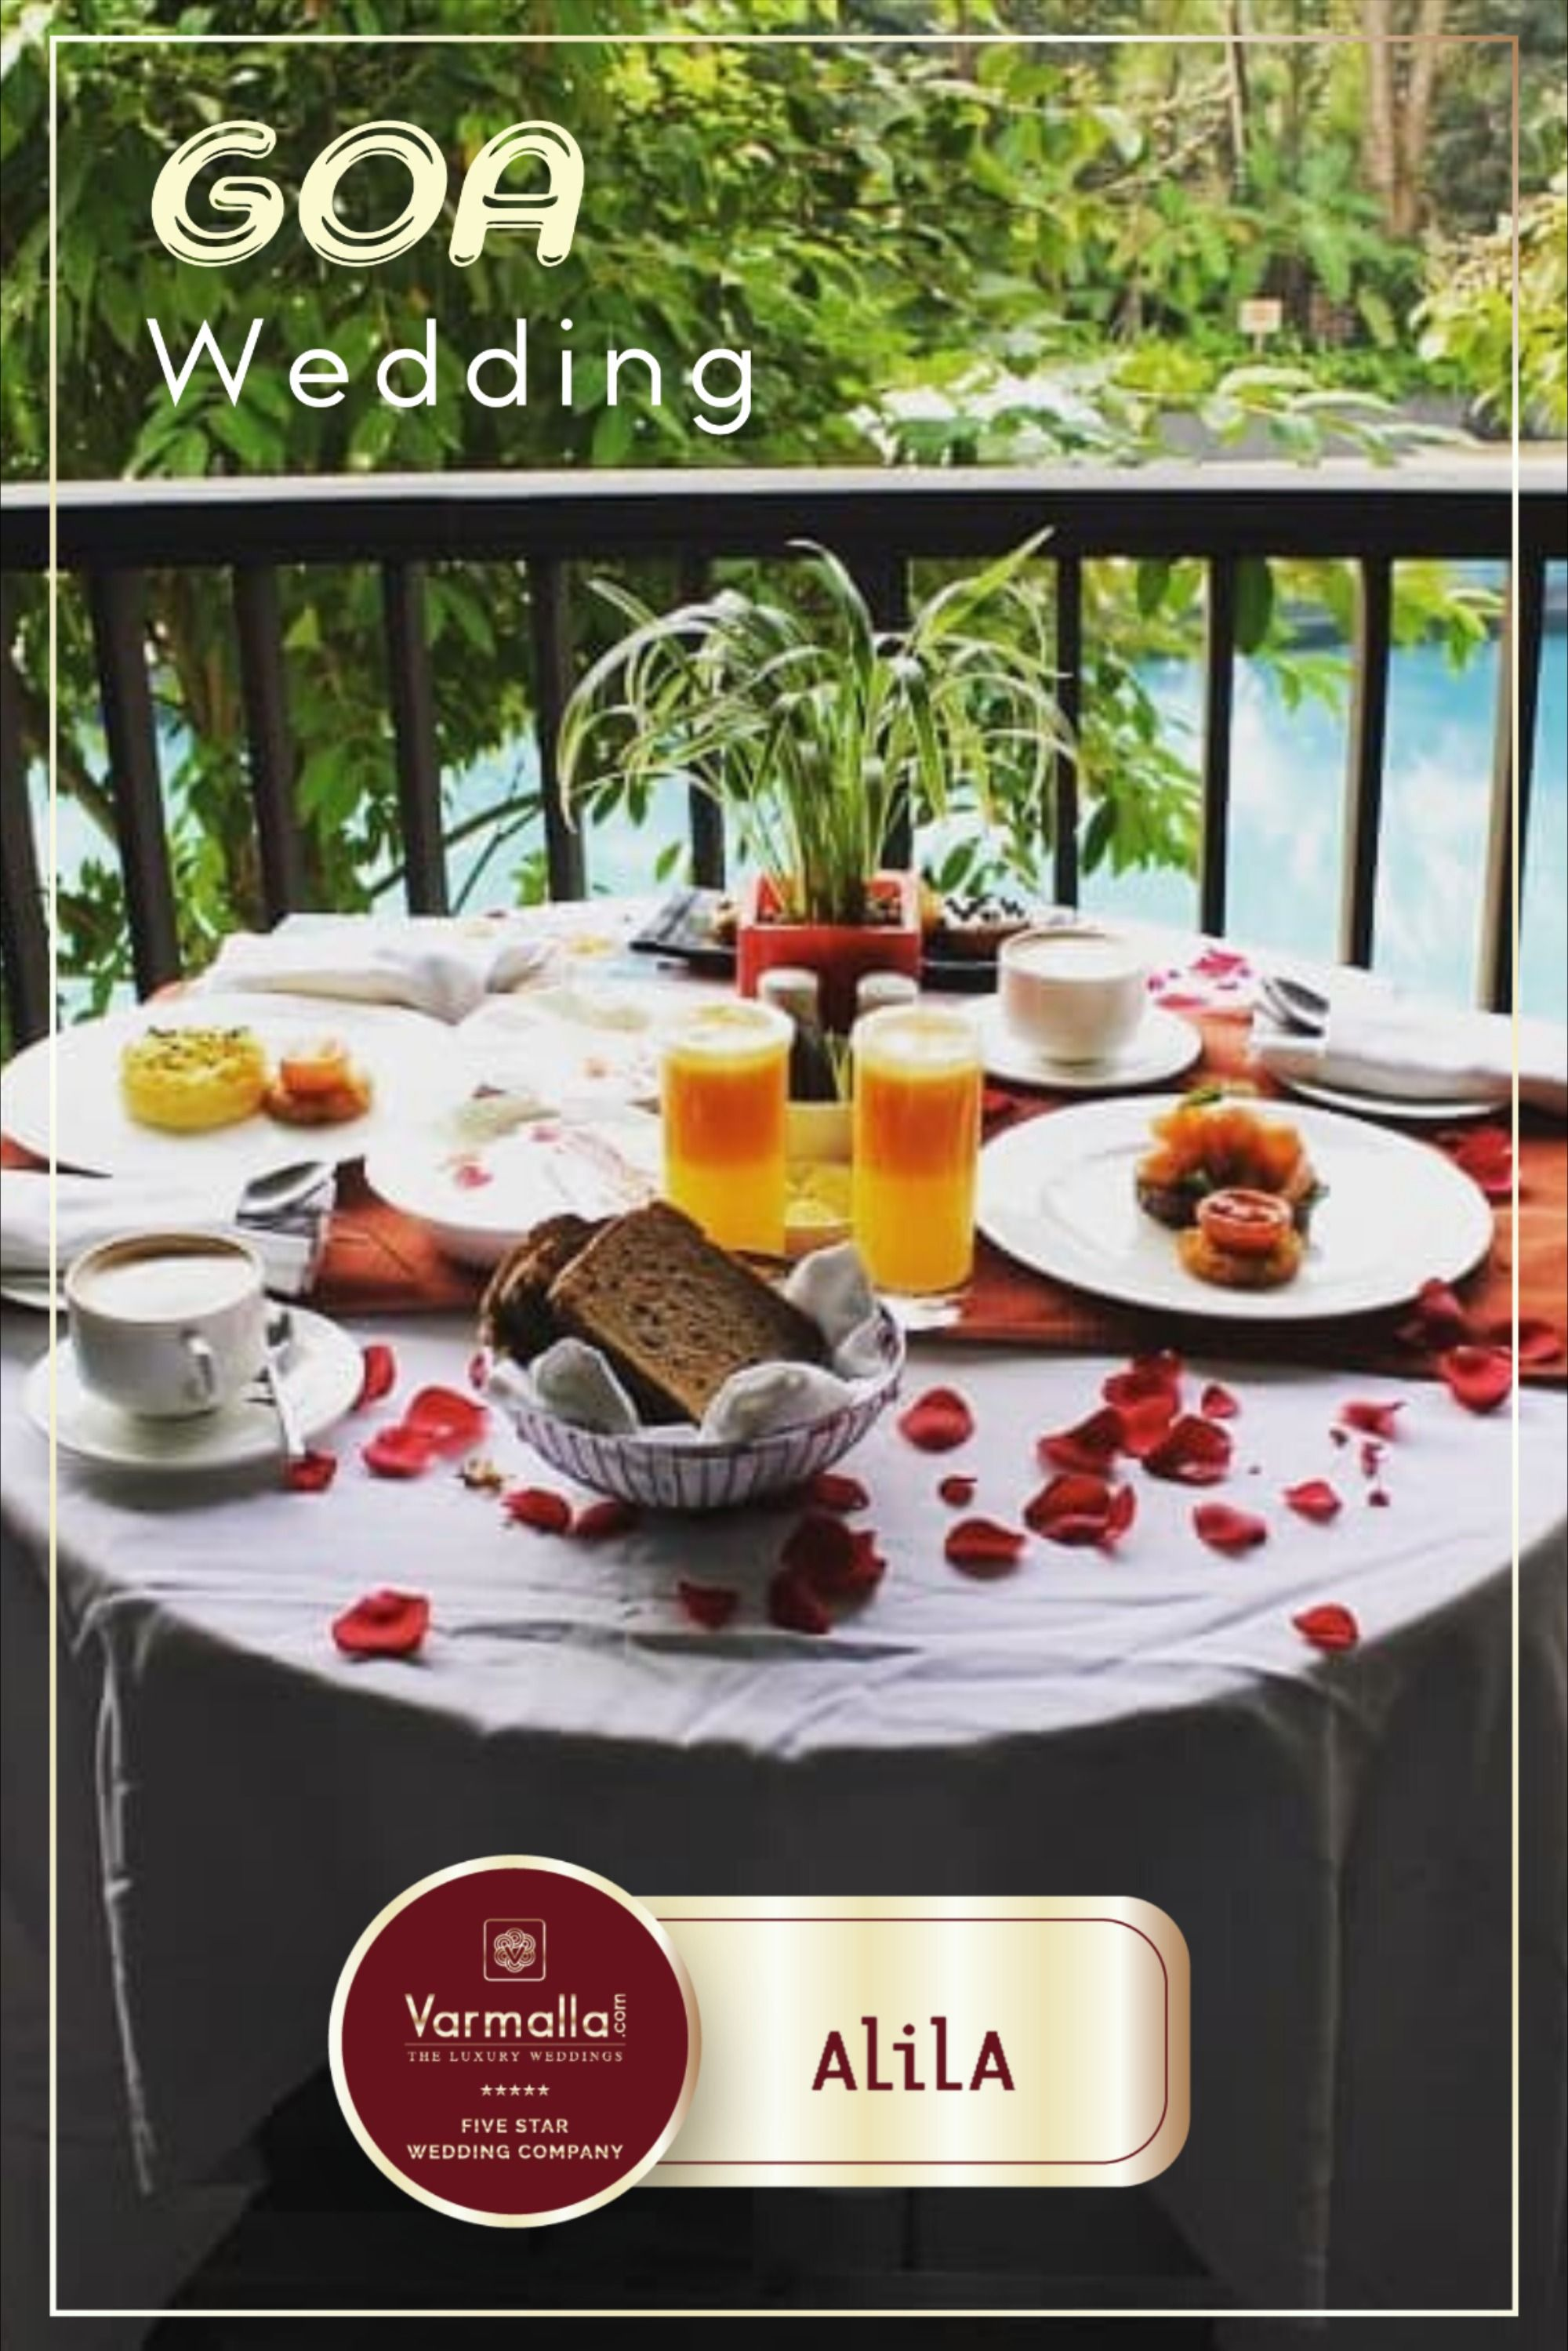 Spend great time here and get unforgotable memories of your wedding...#aliladiwagoa #aliladiwa #aliladiwaweddings #alilahotels #ramadainn  #ramadahotel #tajmahal #tajpalace #goa #goaindia #goataco #weddinginvitationcards #honeymoon #honeymoonpackages #bridallehenga #bridalmakeup #bridalmehndidesign #bridalmehndi #Bridalsaree #bridaljewellery #bride #indianbride #bridegroom #eventmanagement #weddingplanner #weddinginvitationcards #destination #destinationwedding #weddingdecorations#weddinggift